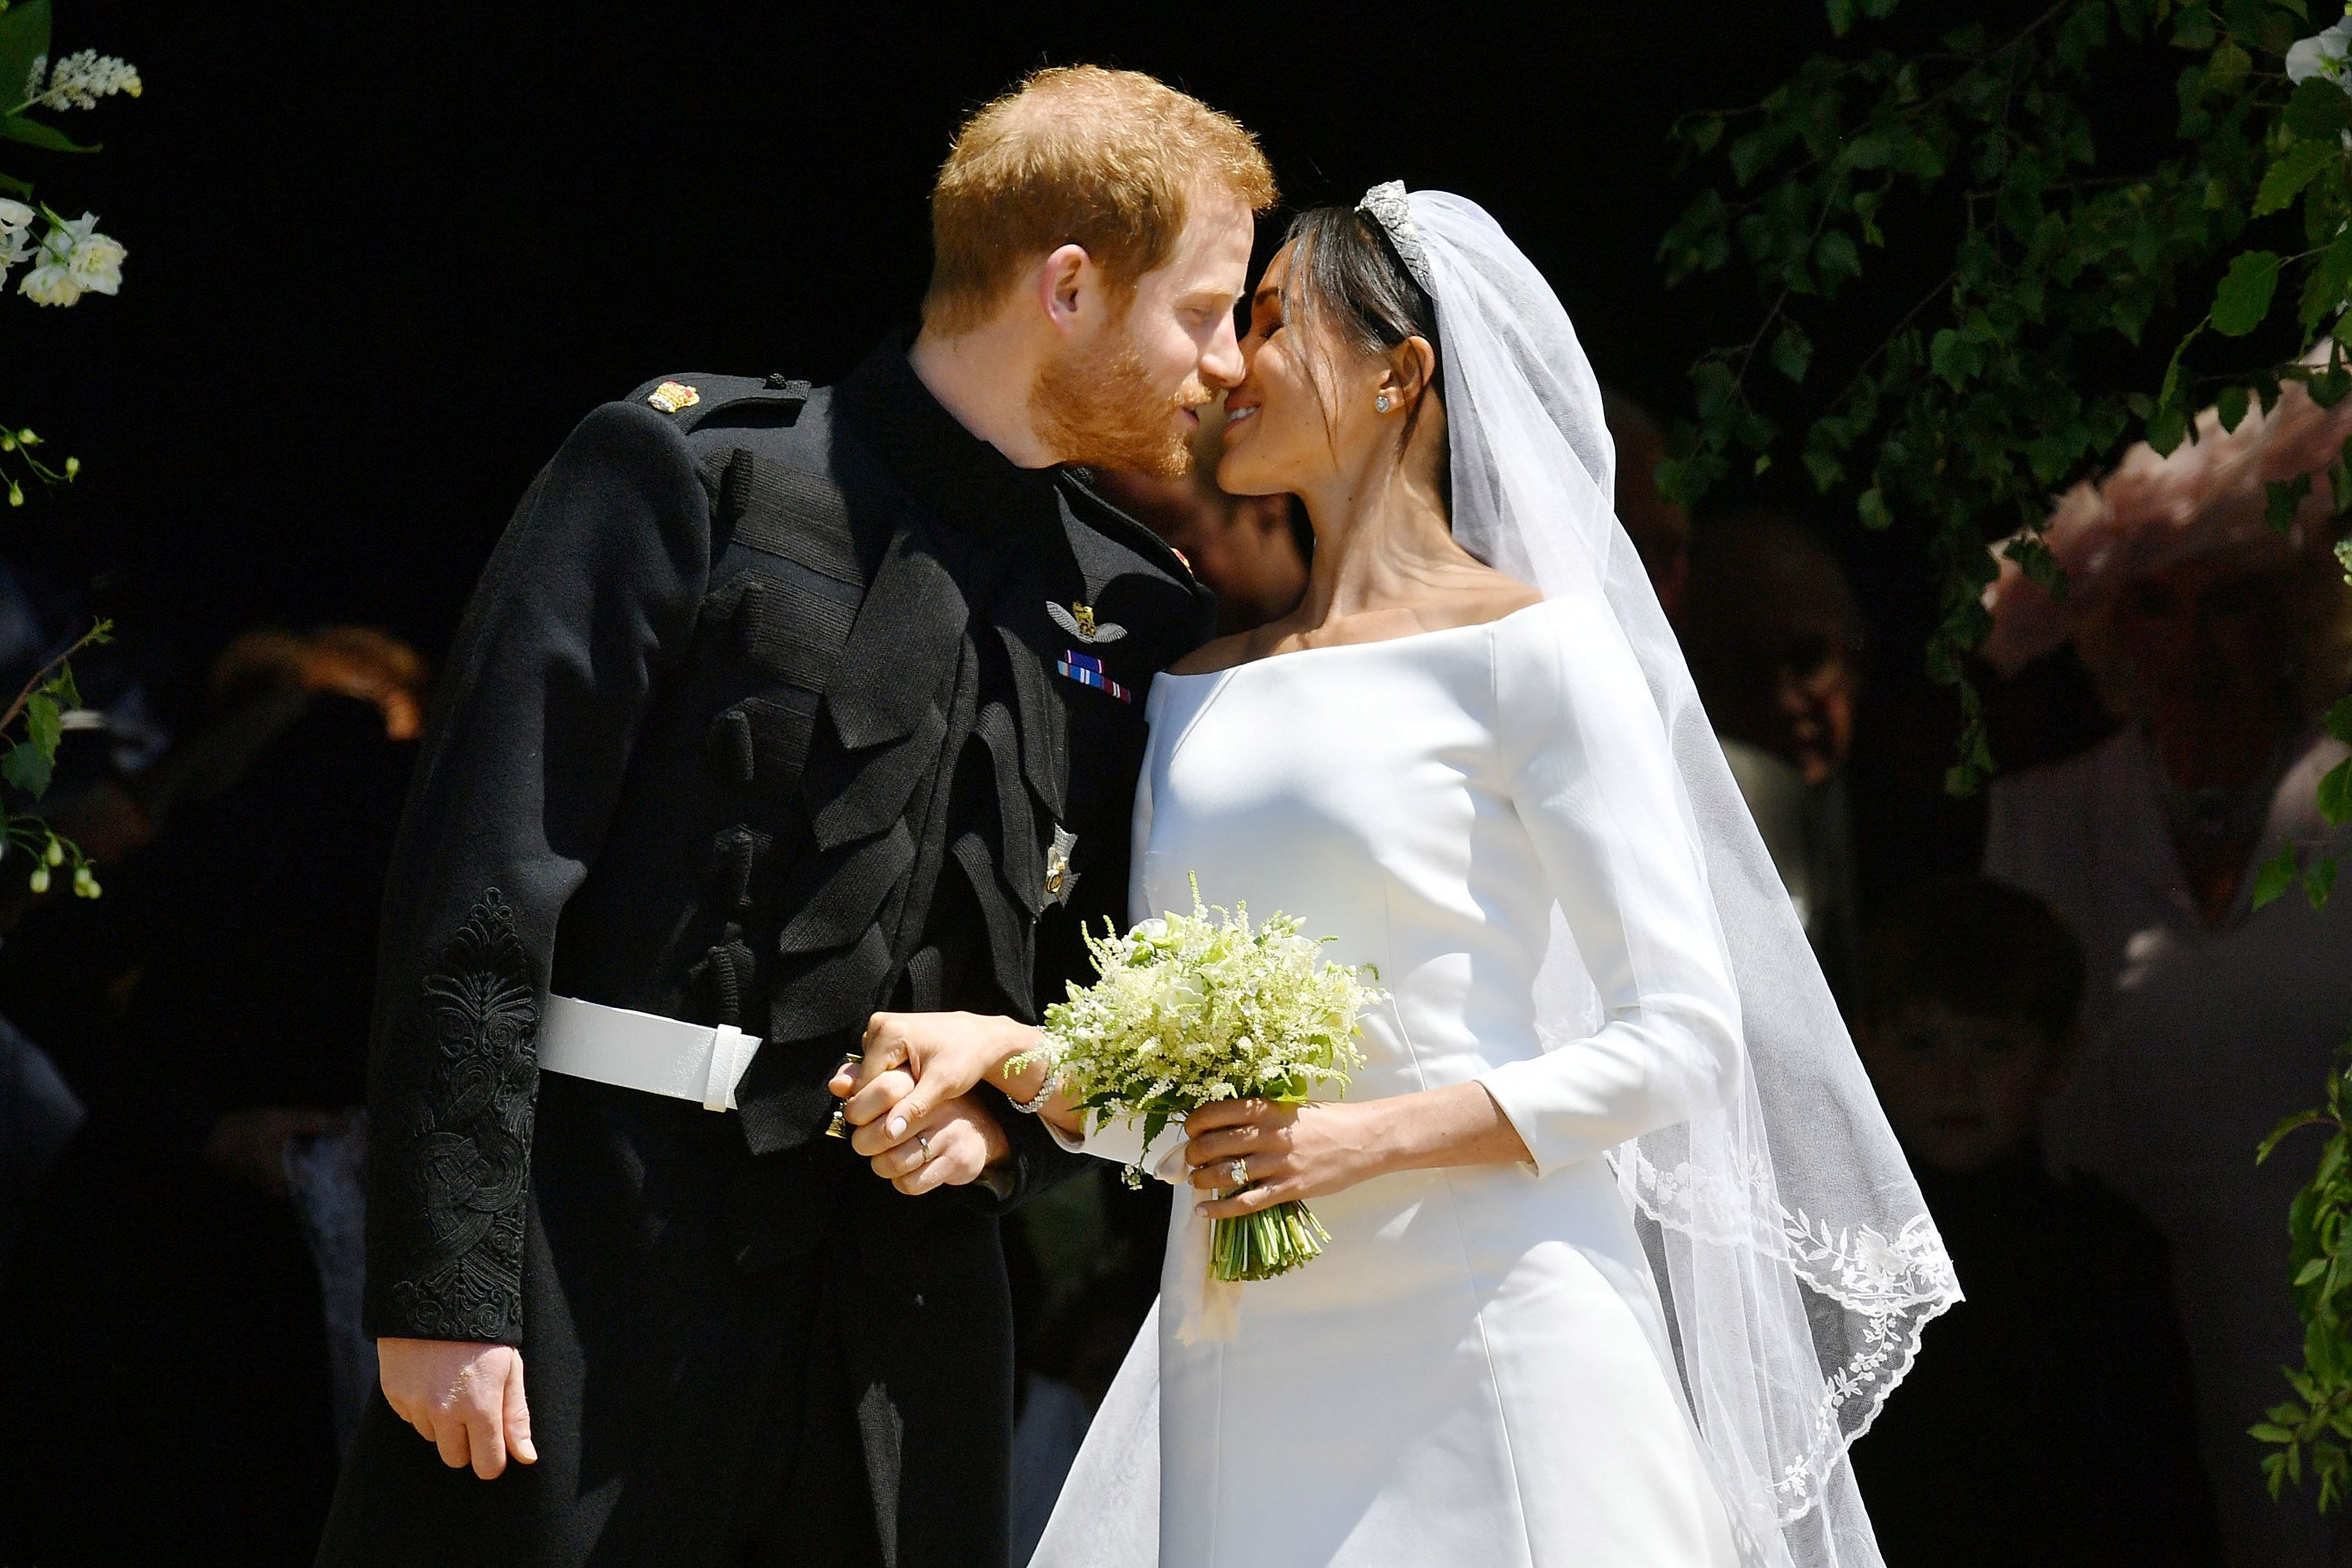 Meghan markle prince harry royal wedding flowers bridal bouquet and meghan markle prince harry royal wedding flowers bridal bouquet and florist guide izmirmasajfo Images